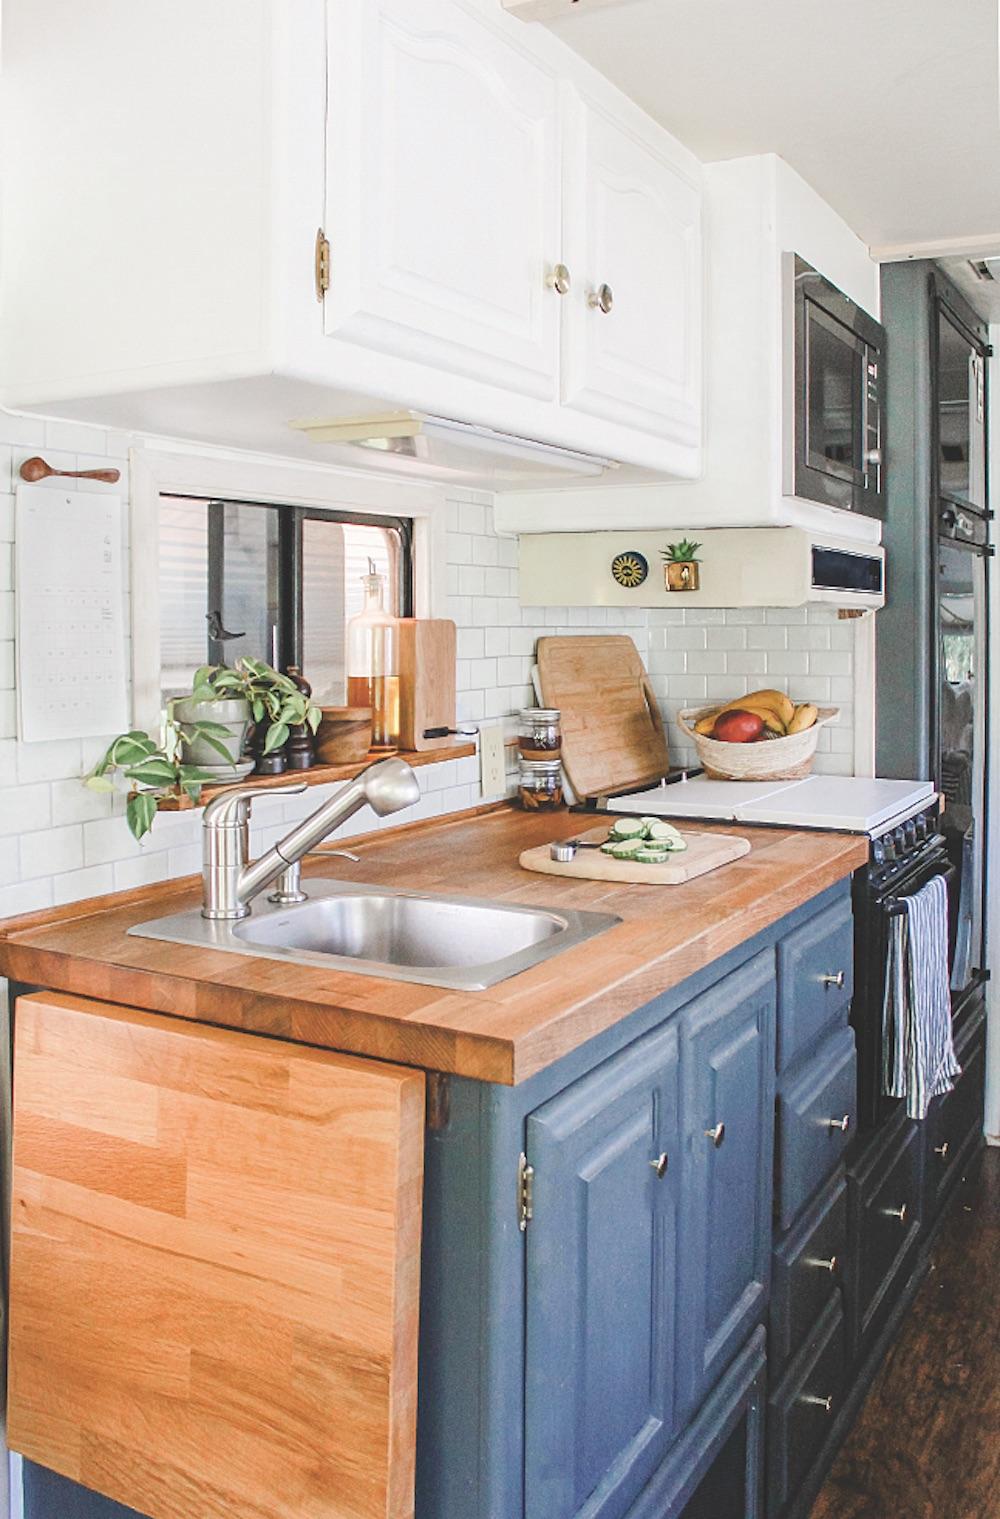 RV Kitchen with Peel and Stick Backsplash